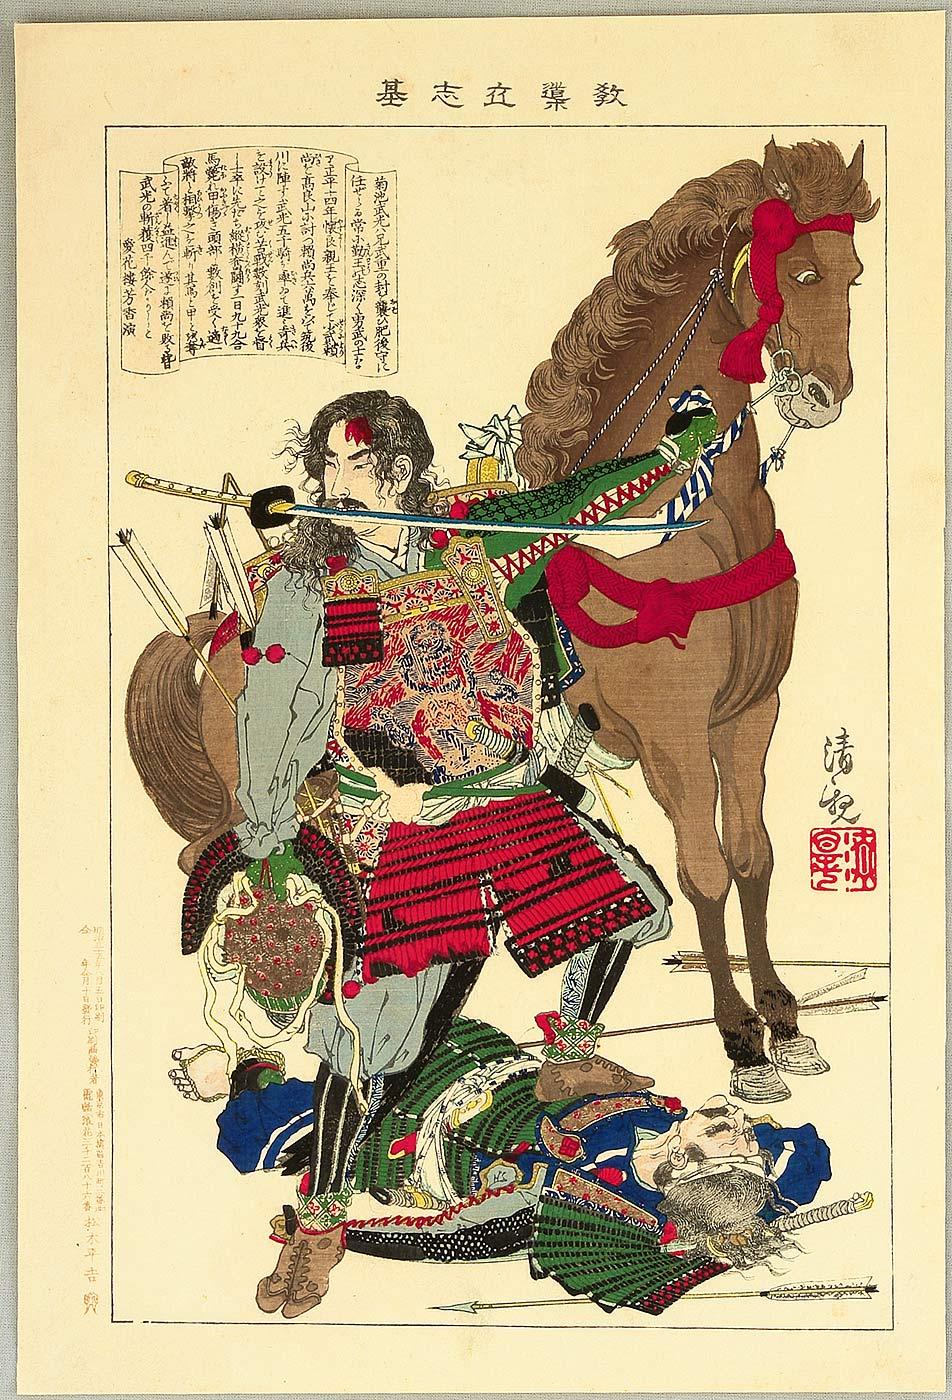 the ancient japanese ninja